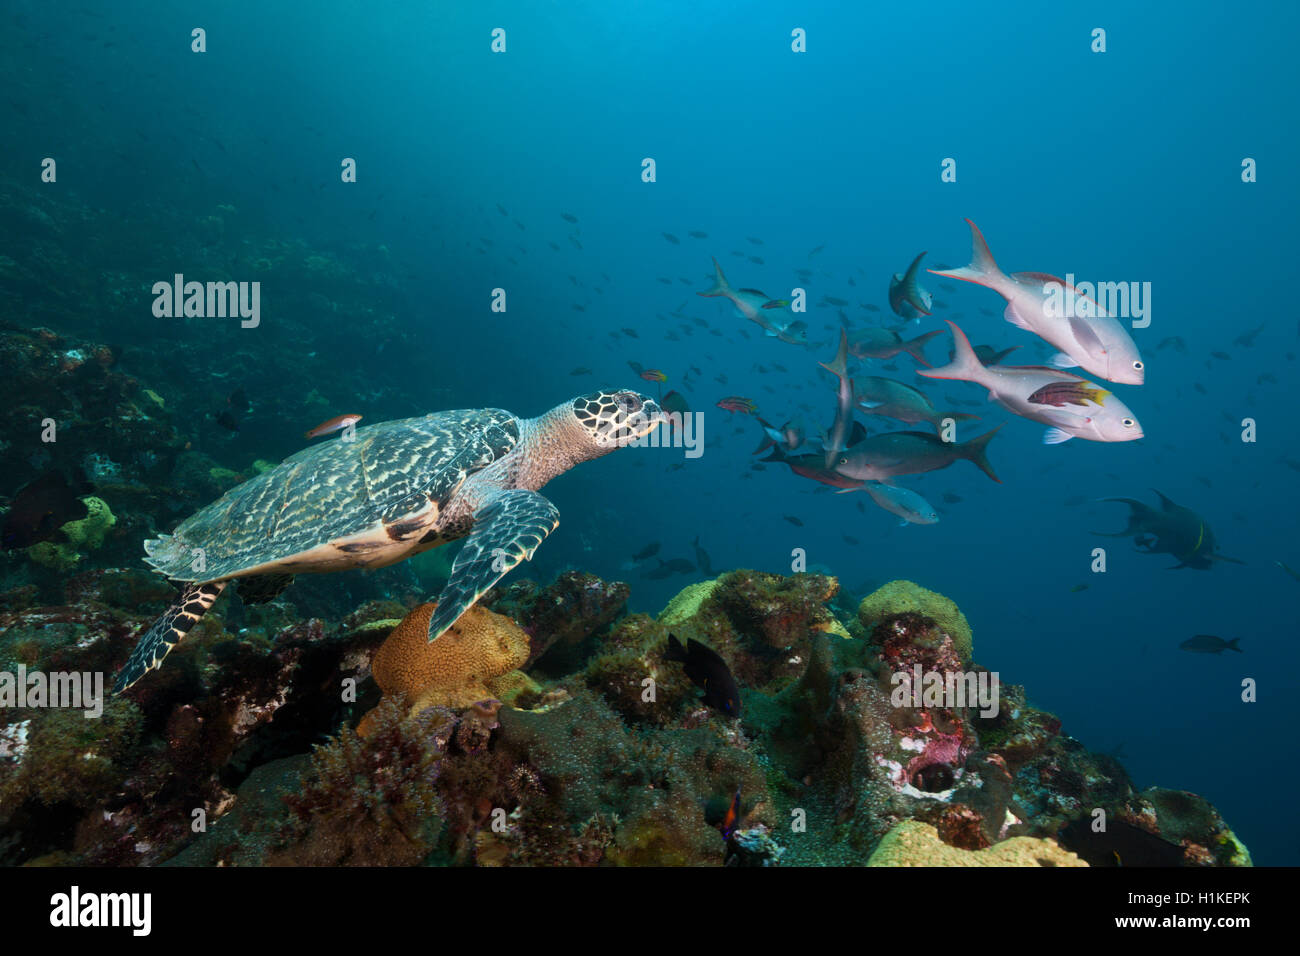 Hawksbill Sea Turtle, Eretmochelys imbricata, Punta Vicente Roca, Isabela Island, Galapagos, Ecuador - Stock Image